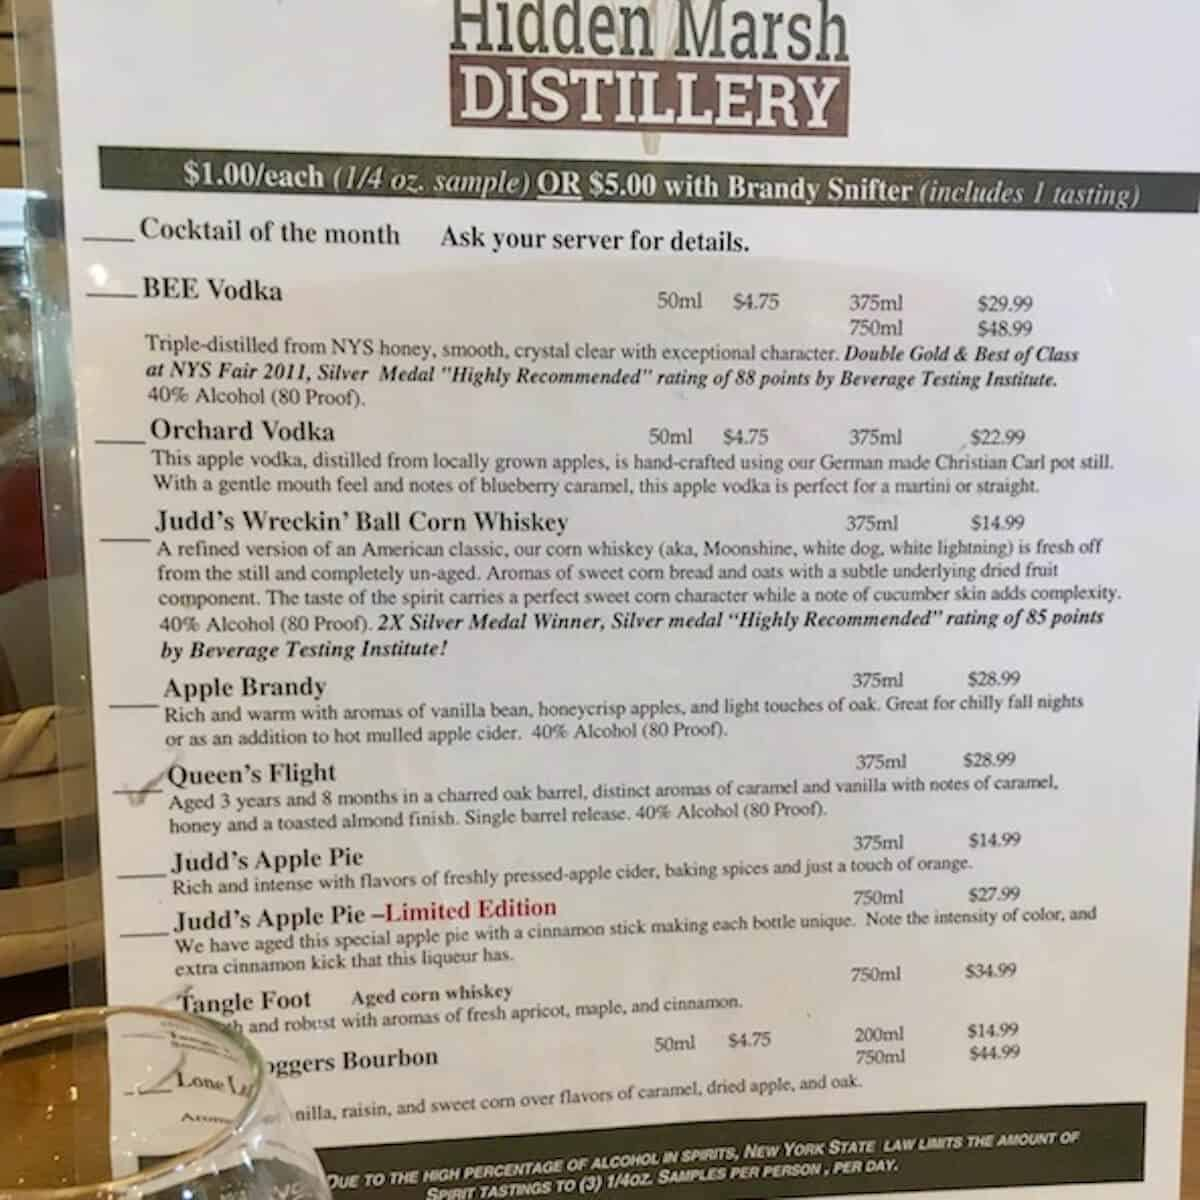 Hidden Marsh Distillery tasting room menu printout.